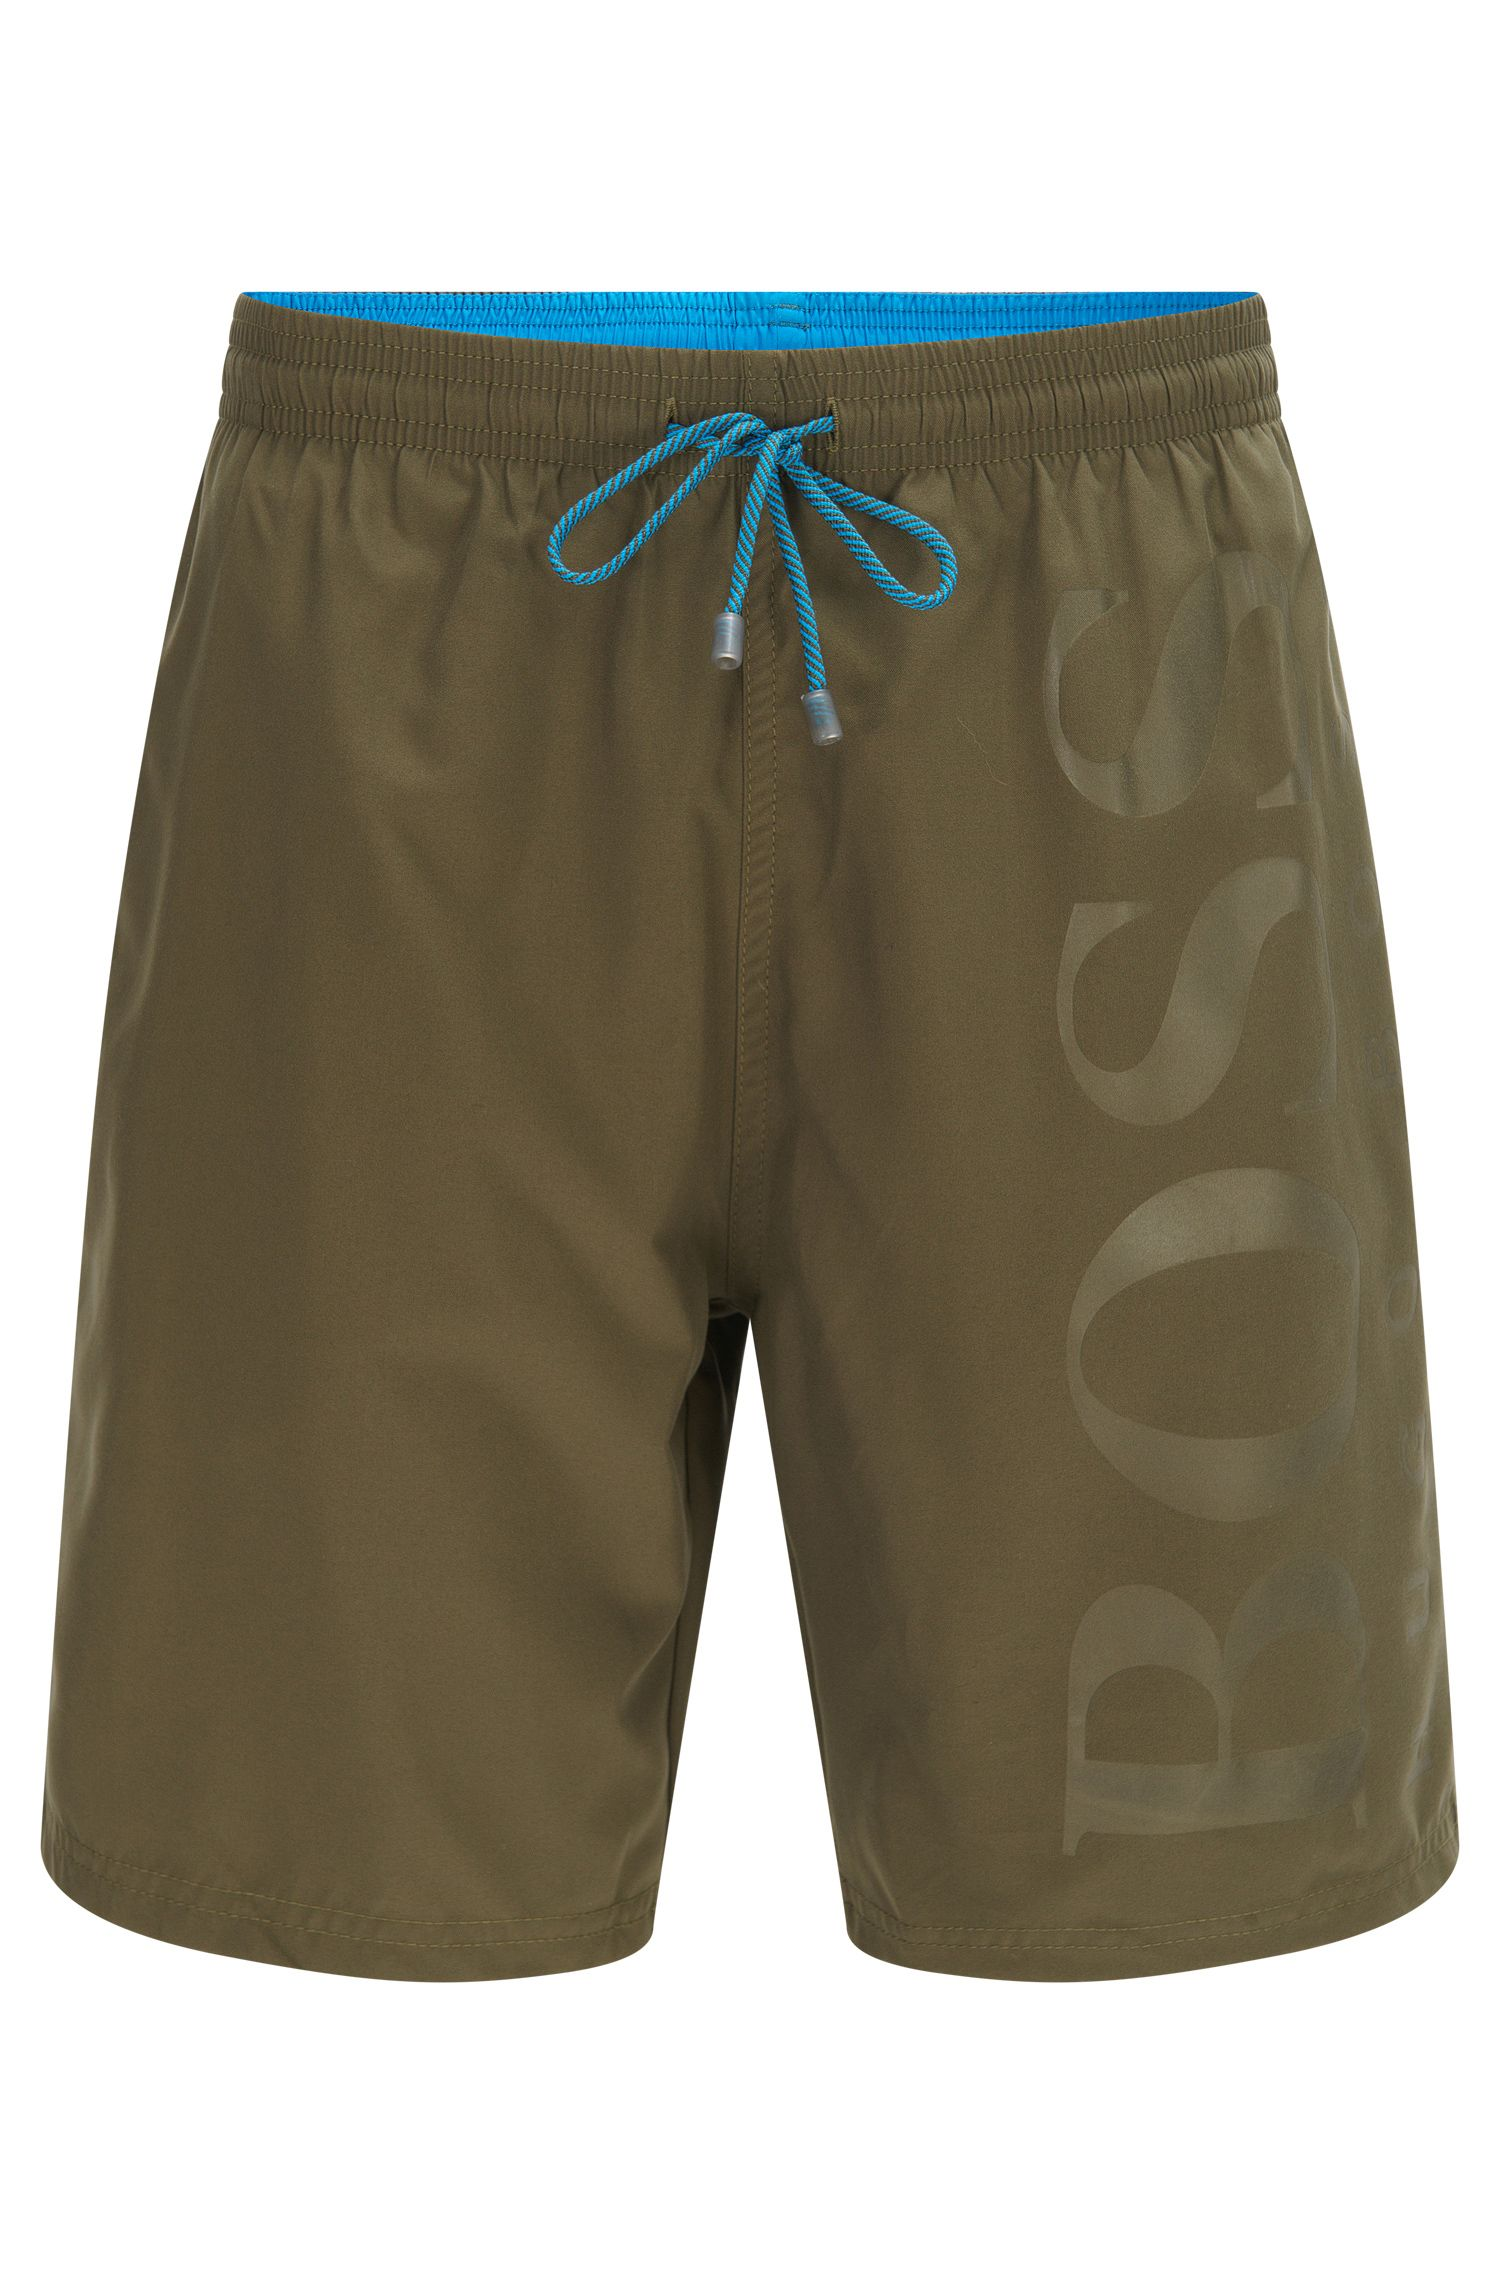 'Orca' | BOSS Logo Swim Trunks